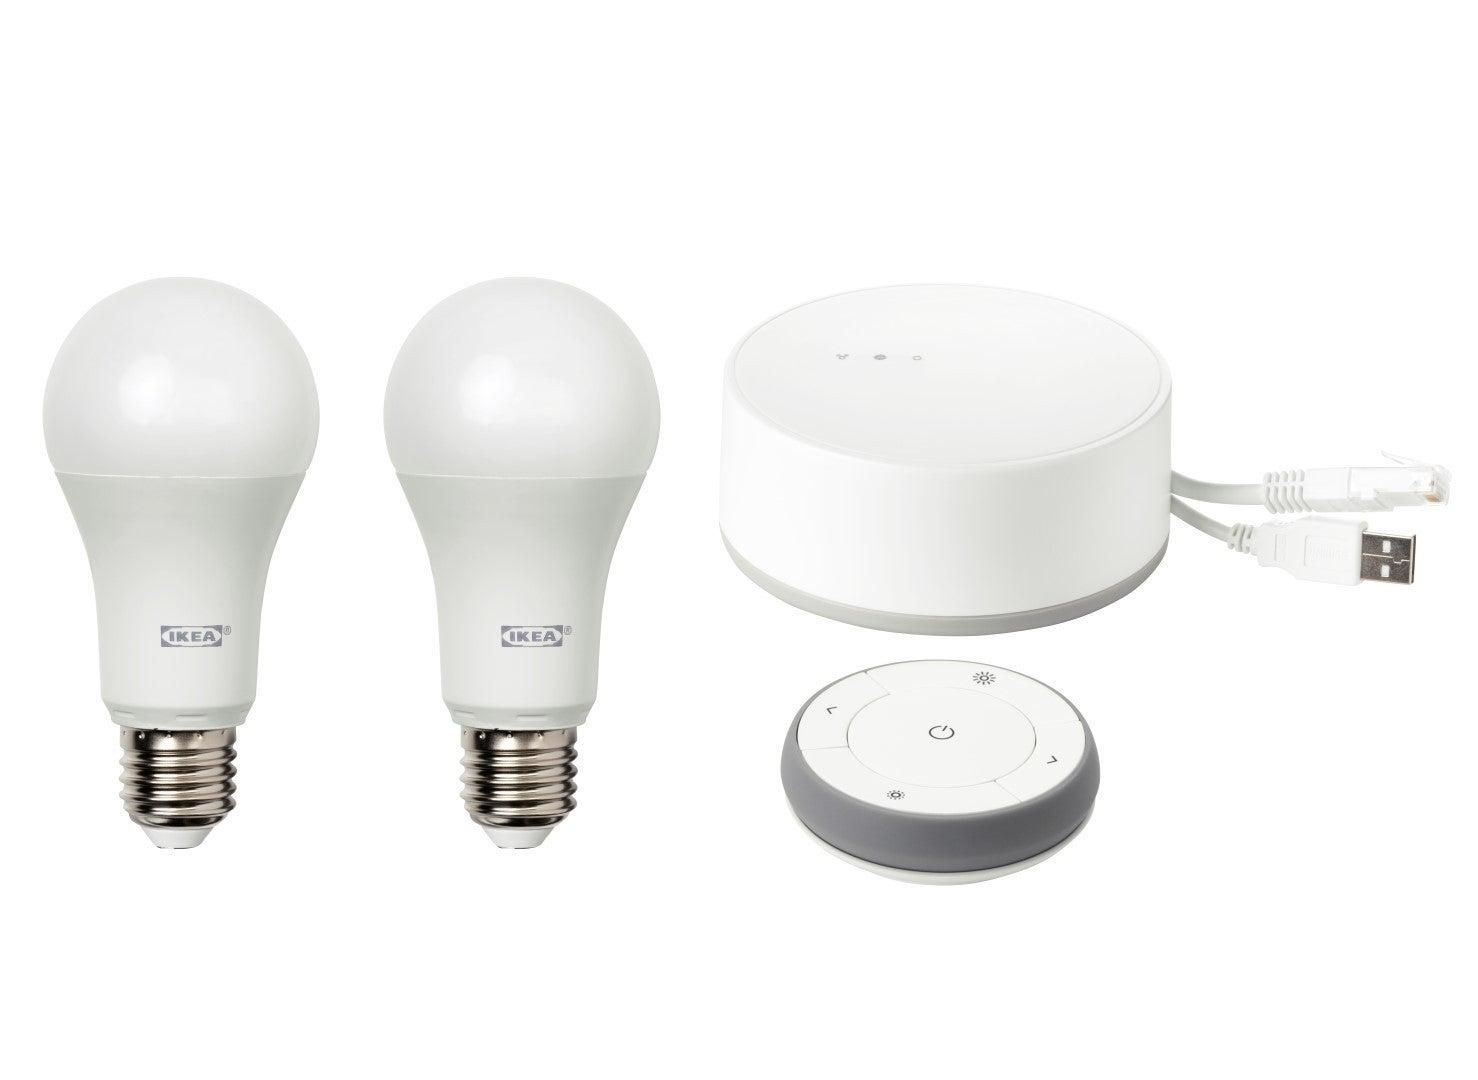 Ikea Tradfri Gateway Kit And Motion Sensor Kit Review